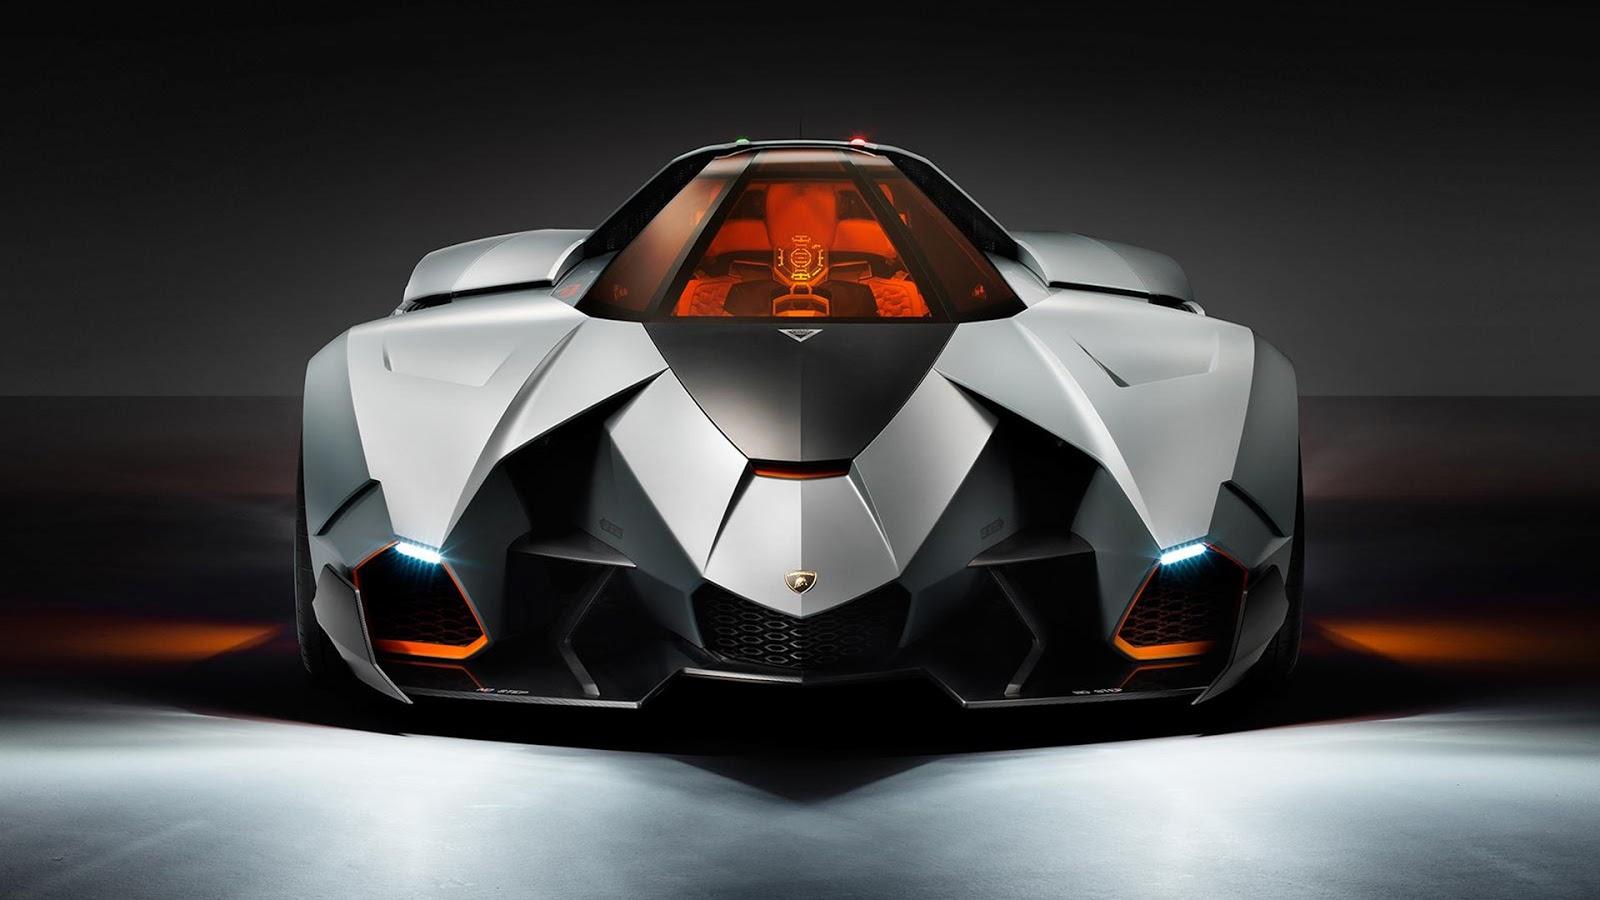 Lamborghini Egoista HD wallpapers | HD Wallpapers (High ...